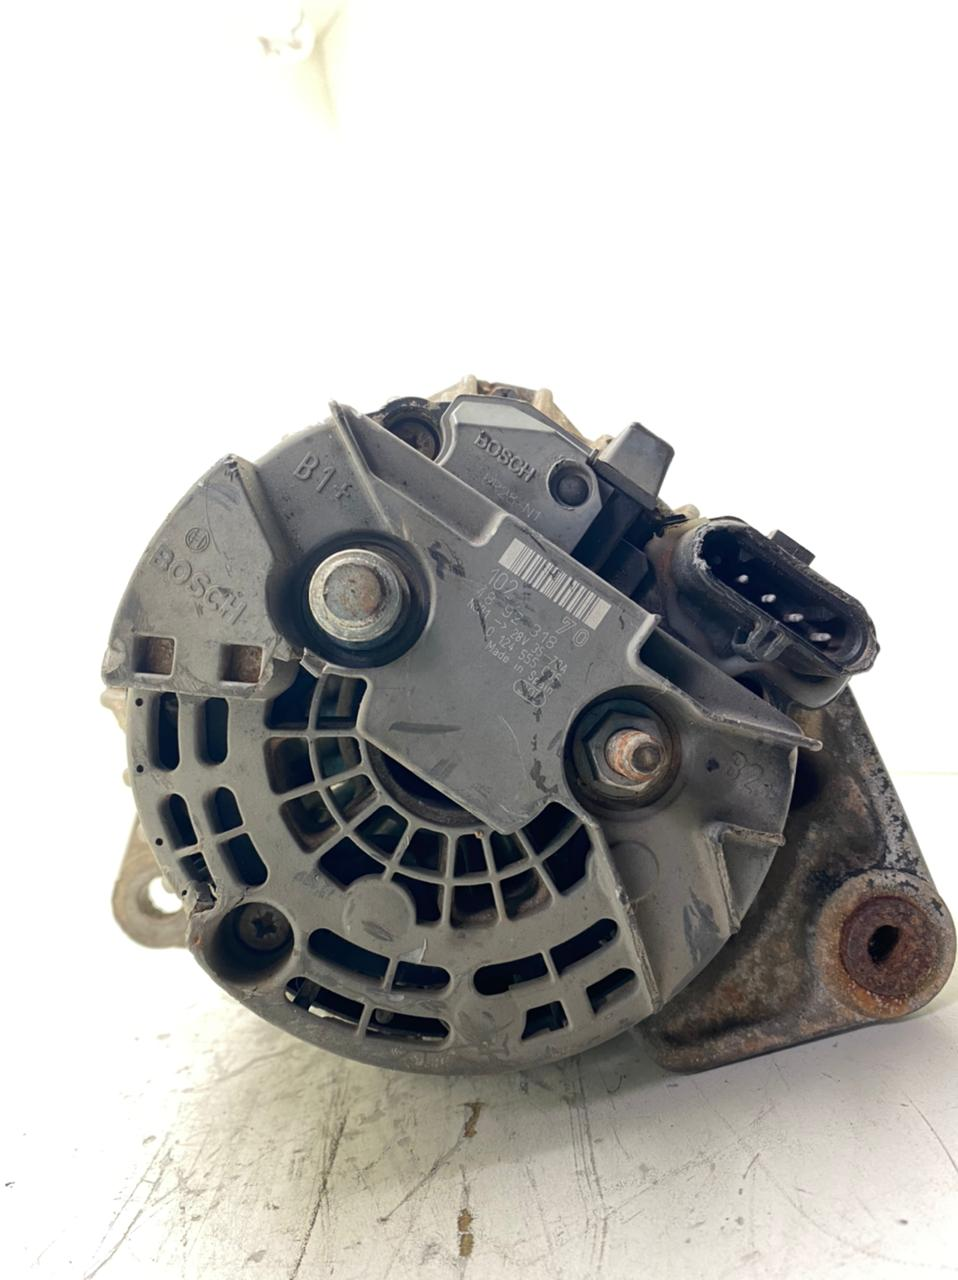 Alternador Bosch 24V 90AMP IVECO EUROCARGO 170E22 170E24 EURITECH CASE 521 CASE 621 CX220 CUMMINS NEW HOLLAND E215B 0124555005 0124655005 4892318 4892320 STR2115 0124555005 0124655005